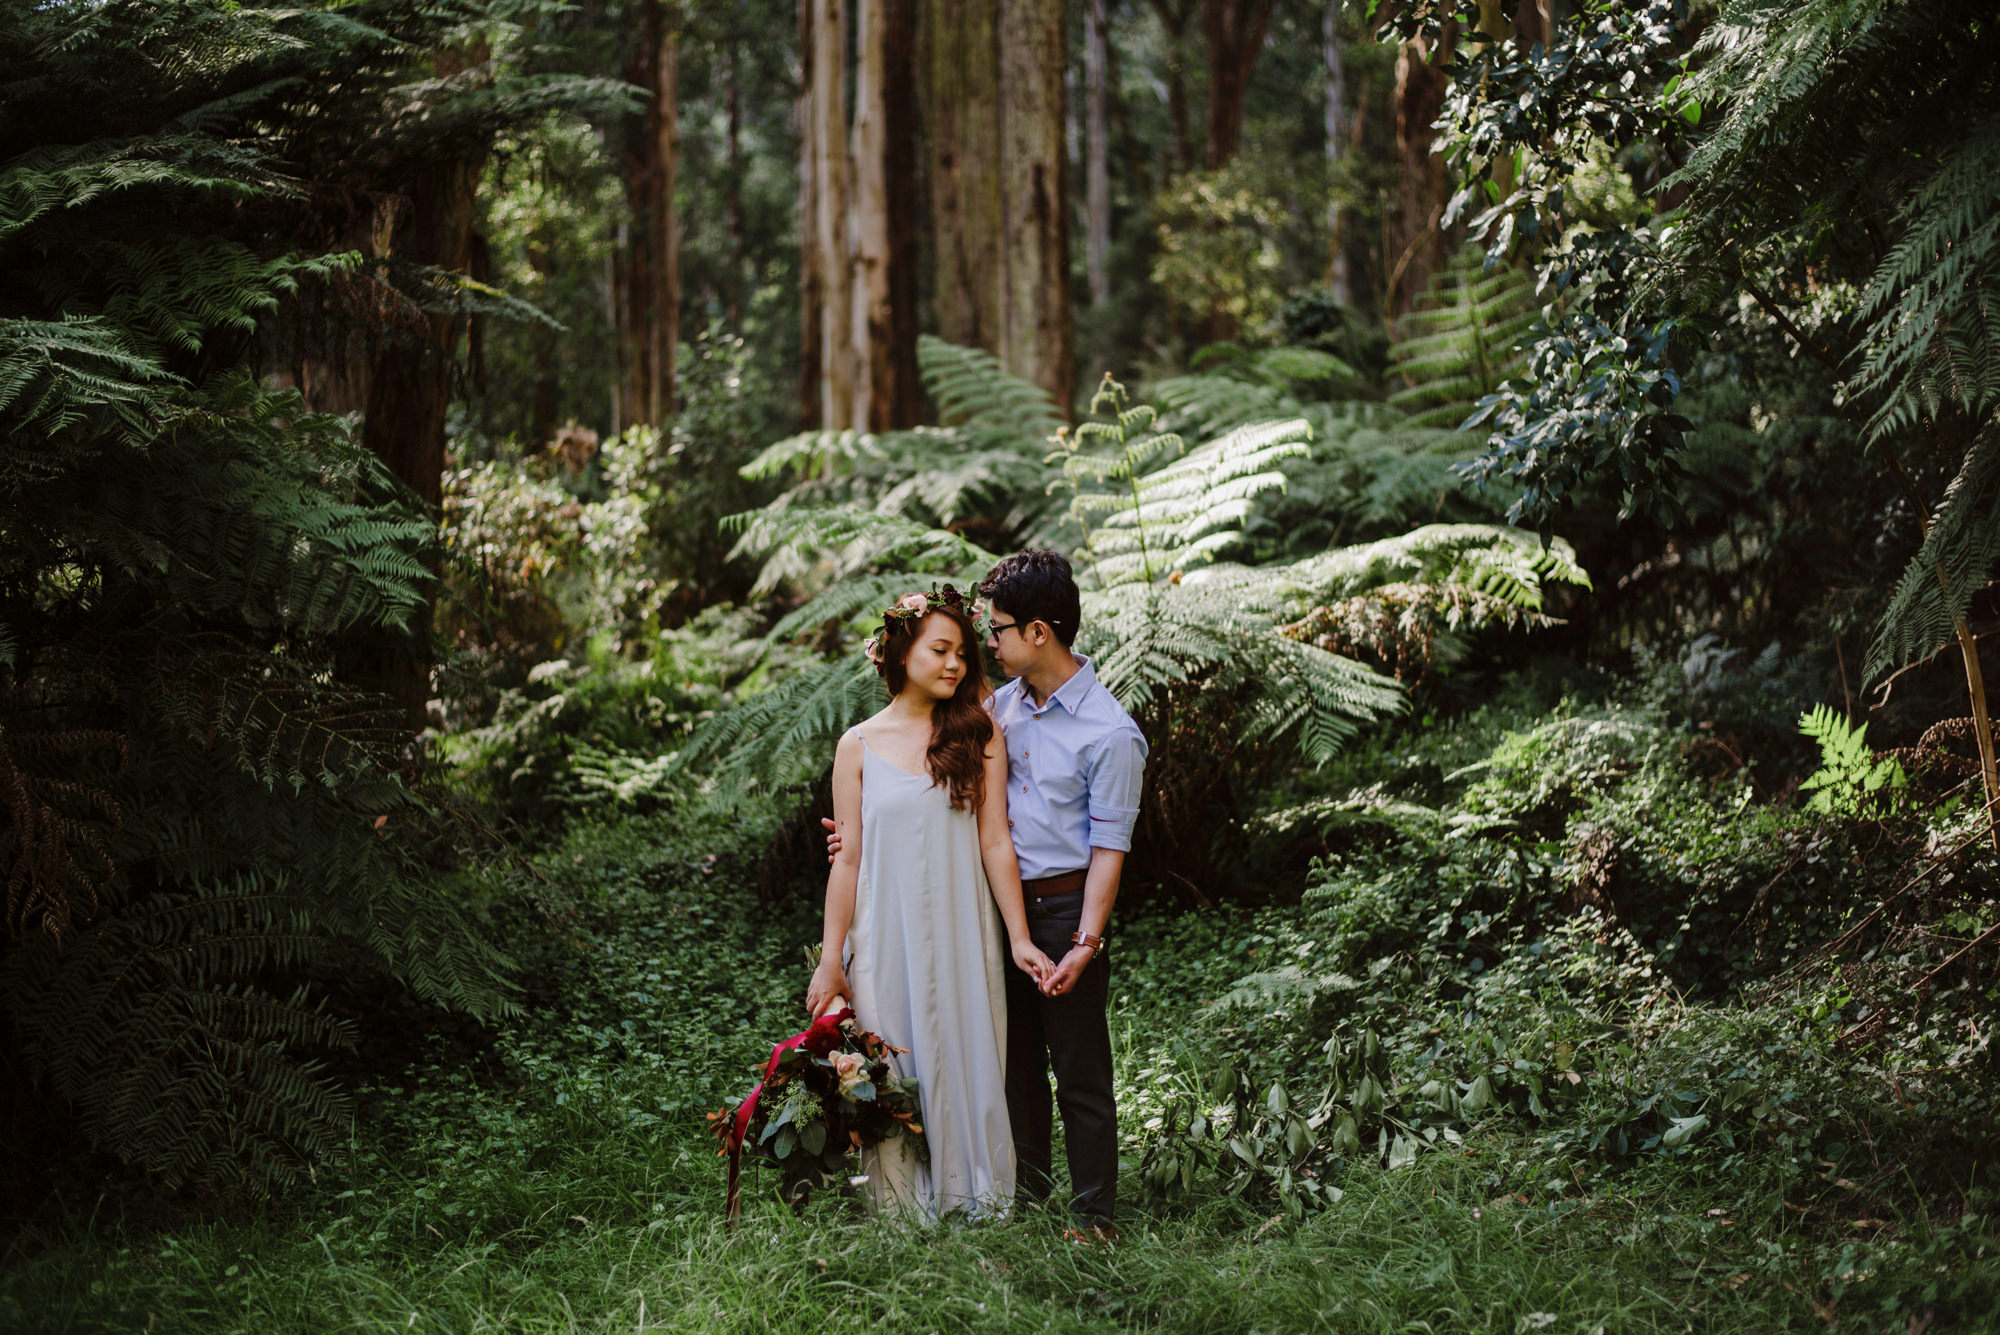 010-melbourne-engagement-wedding-photography